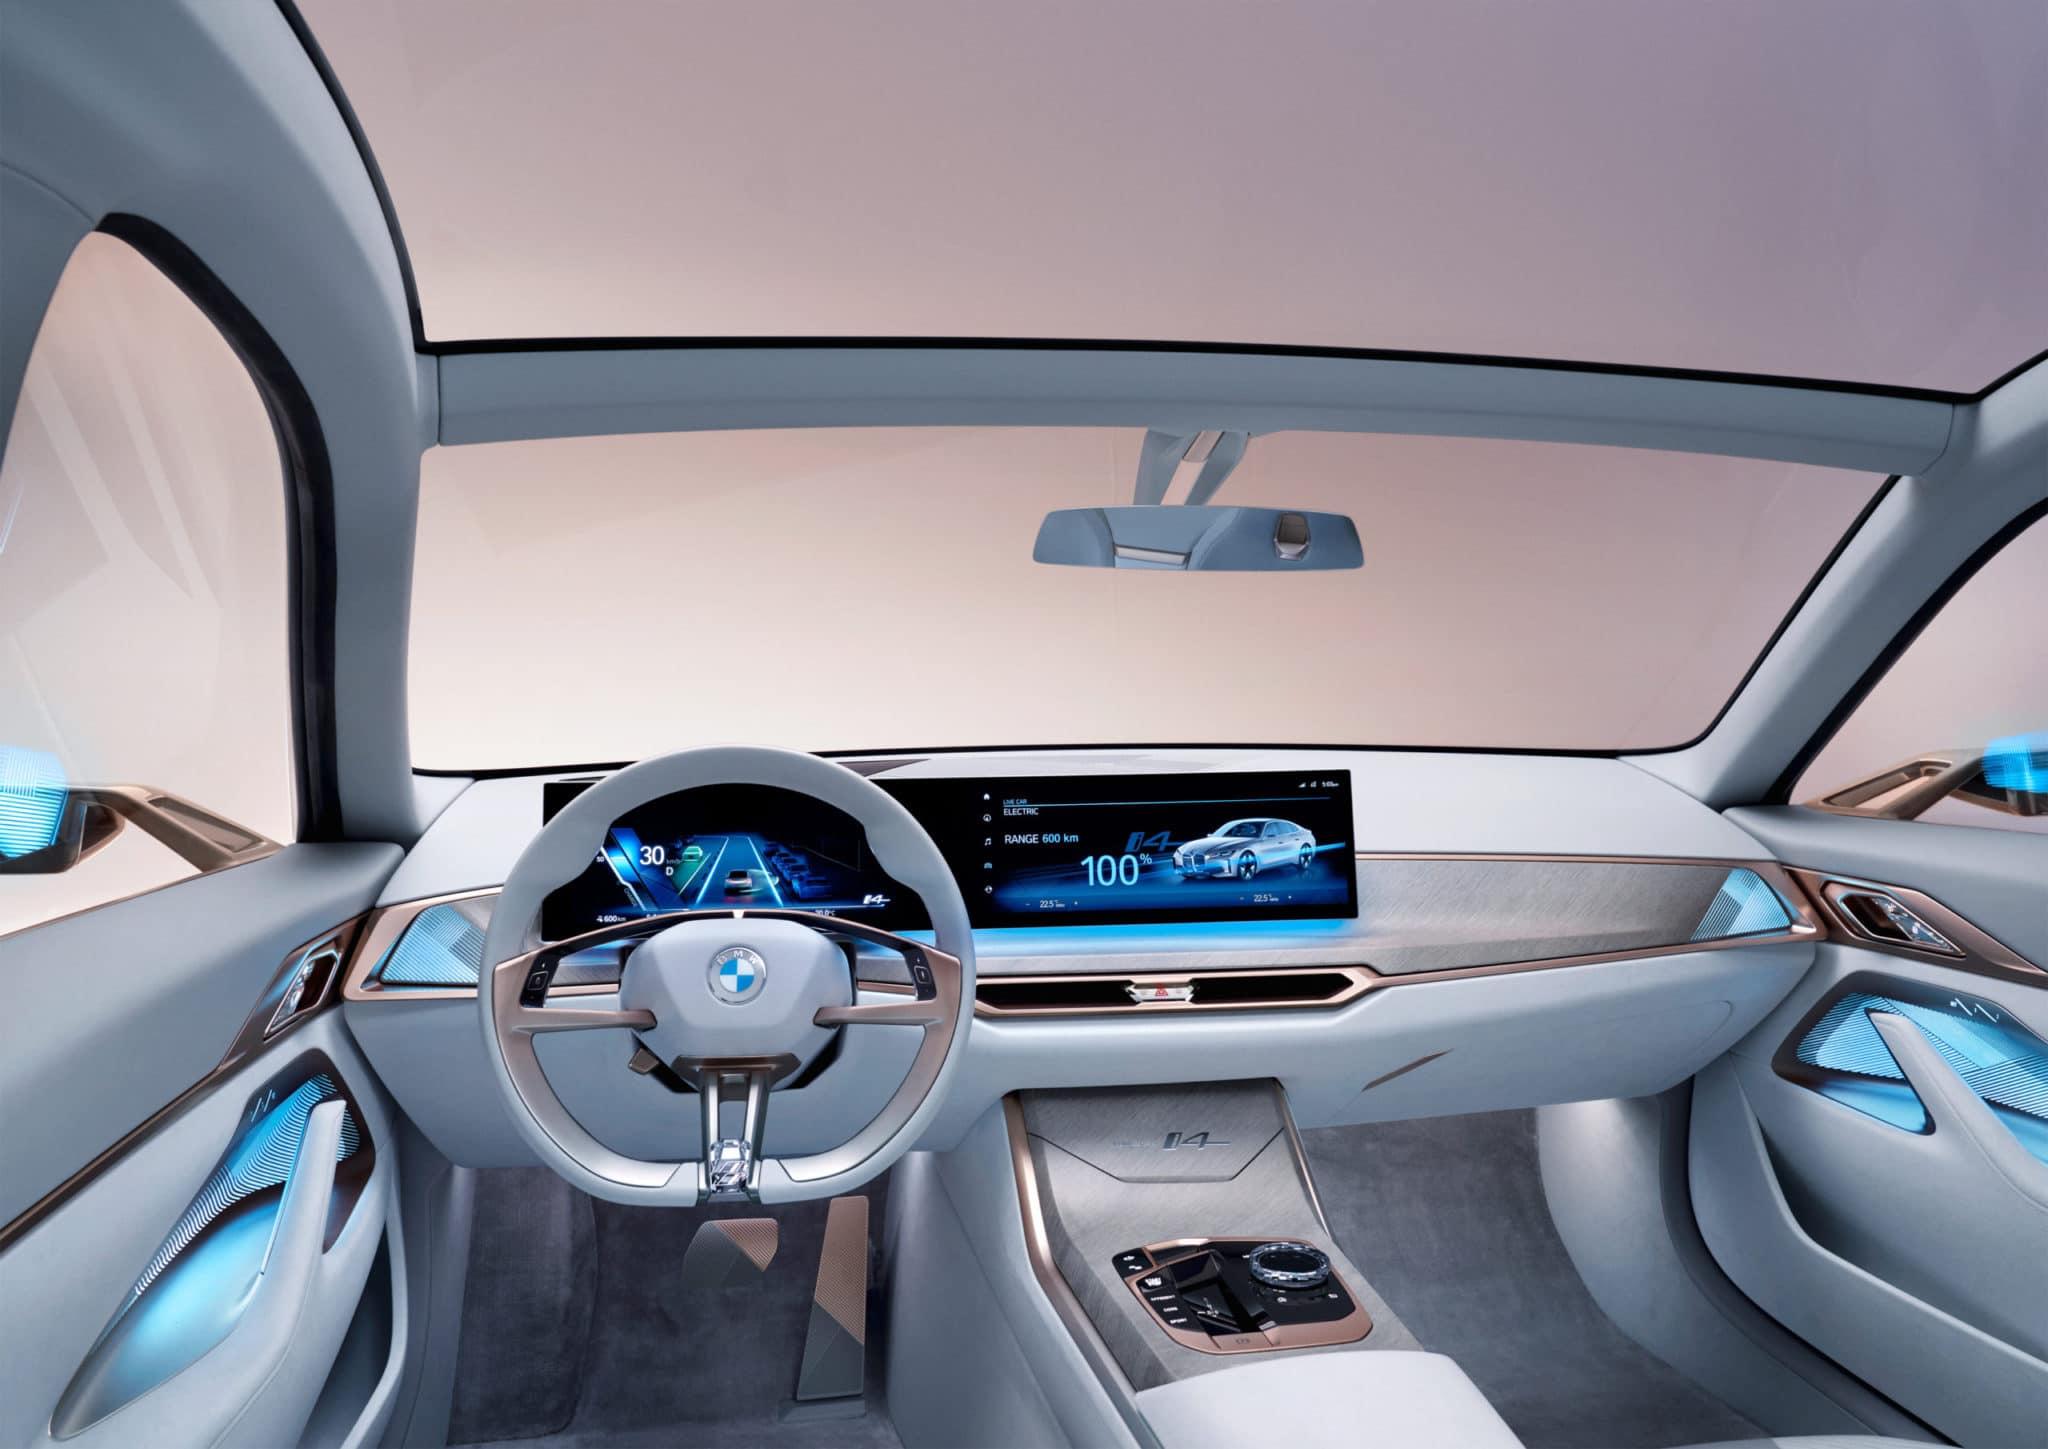 2021 BMW i4 Interior Dash Concept Design